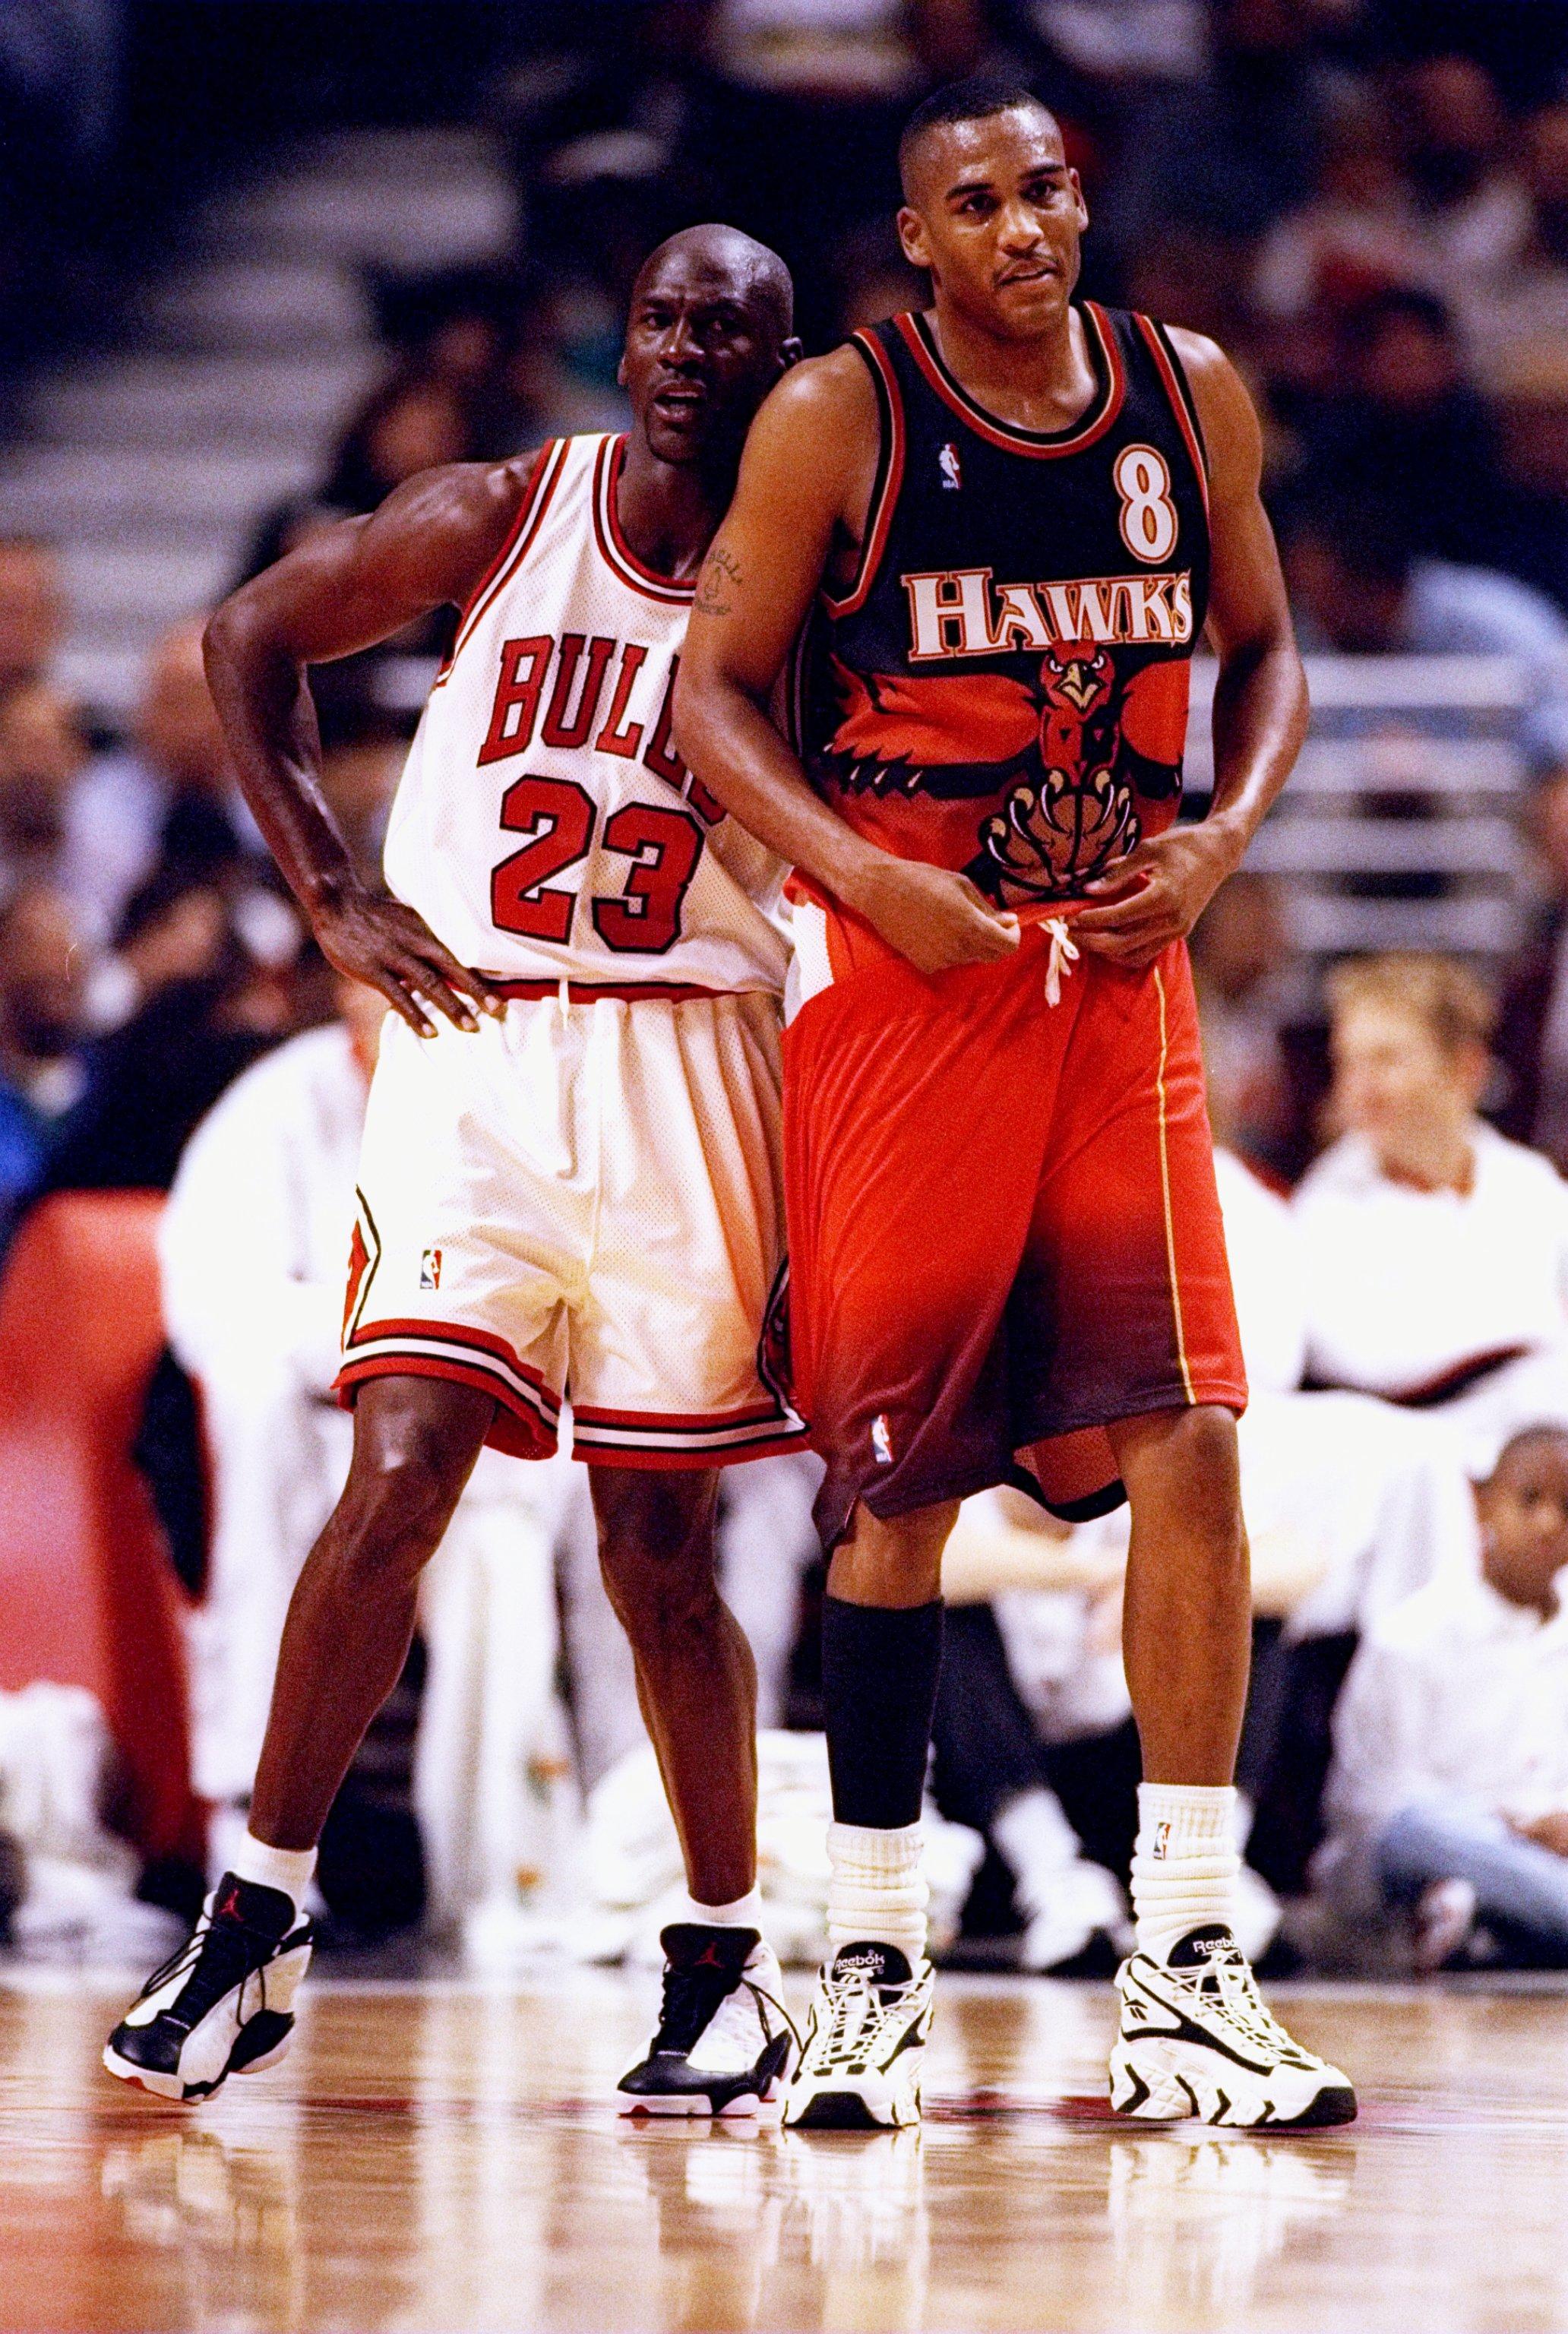 Steve Smith and Michael Jordan